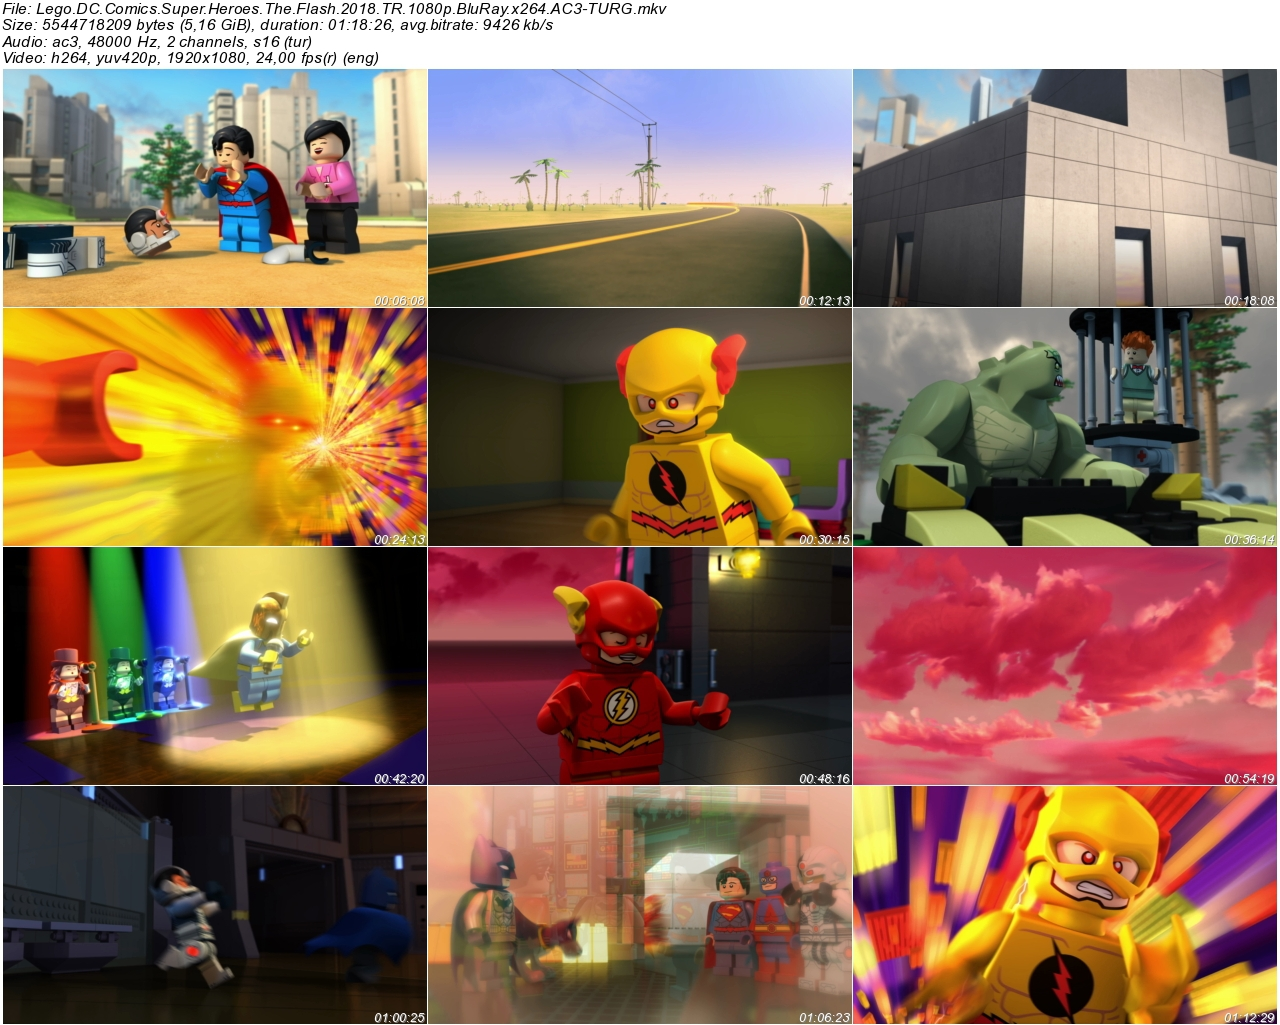 Lego DC Comics Super Heroes The Flash 2018 - 1080p 720p 480p - Türkçe Dublaj Tek Link indir